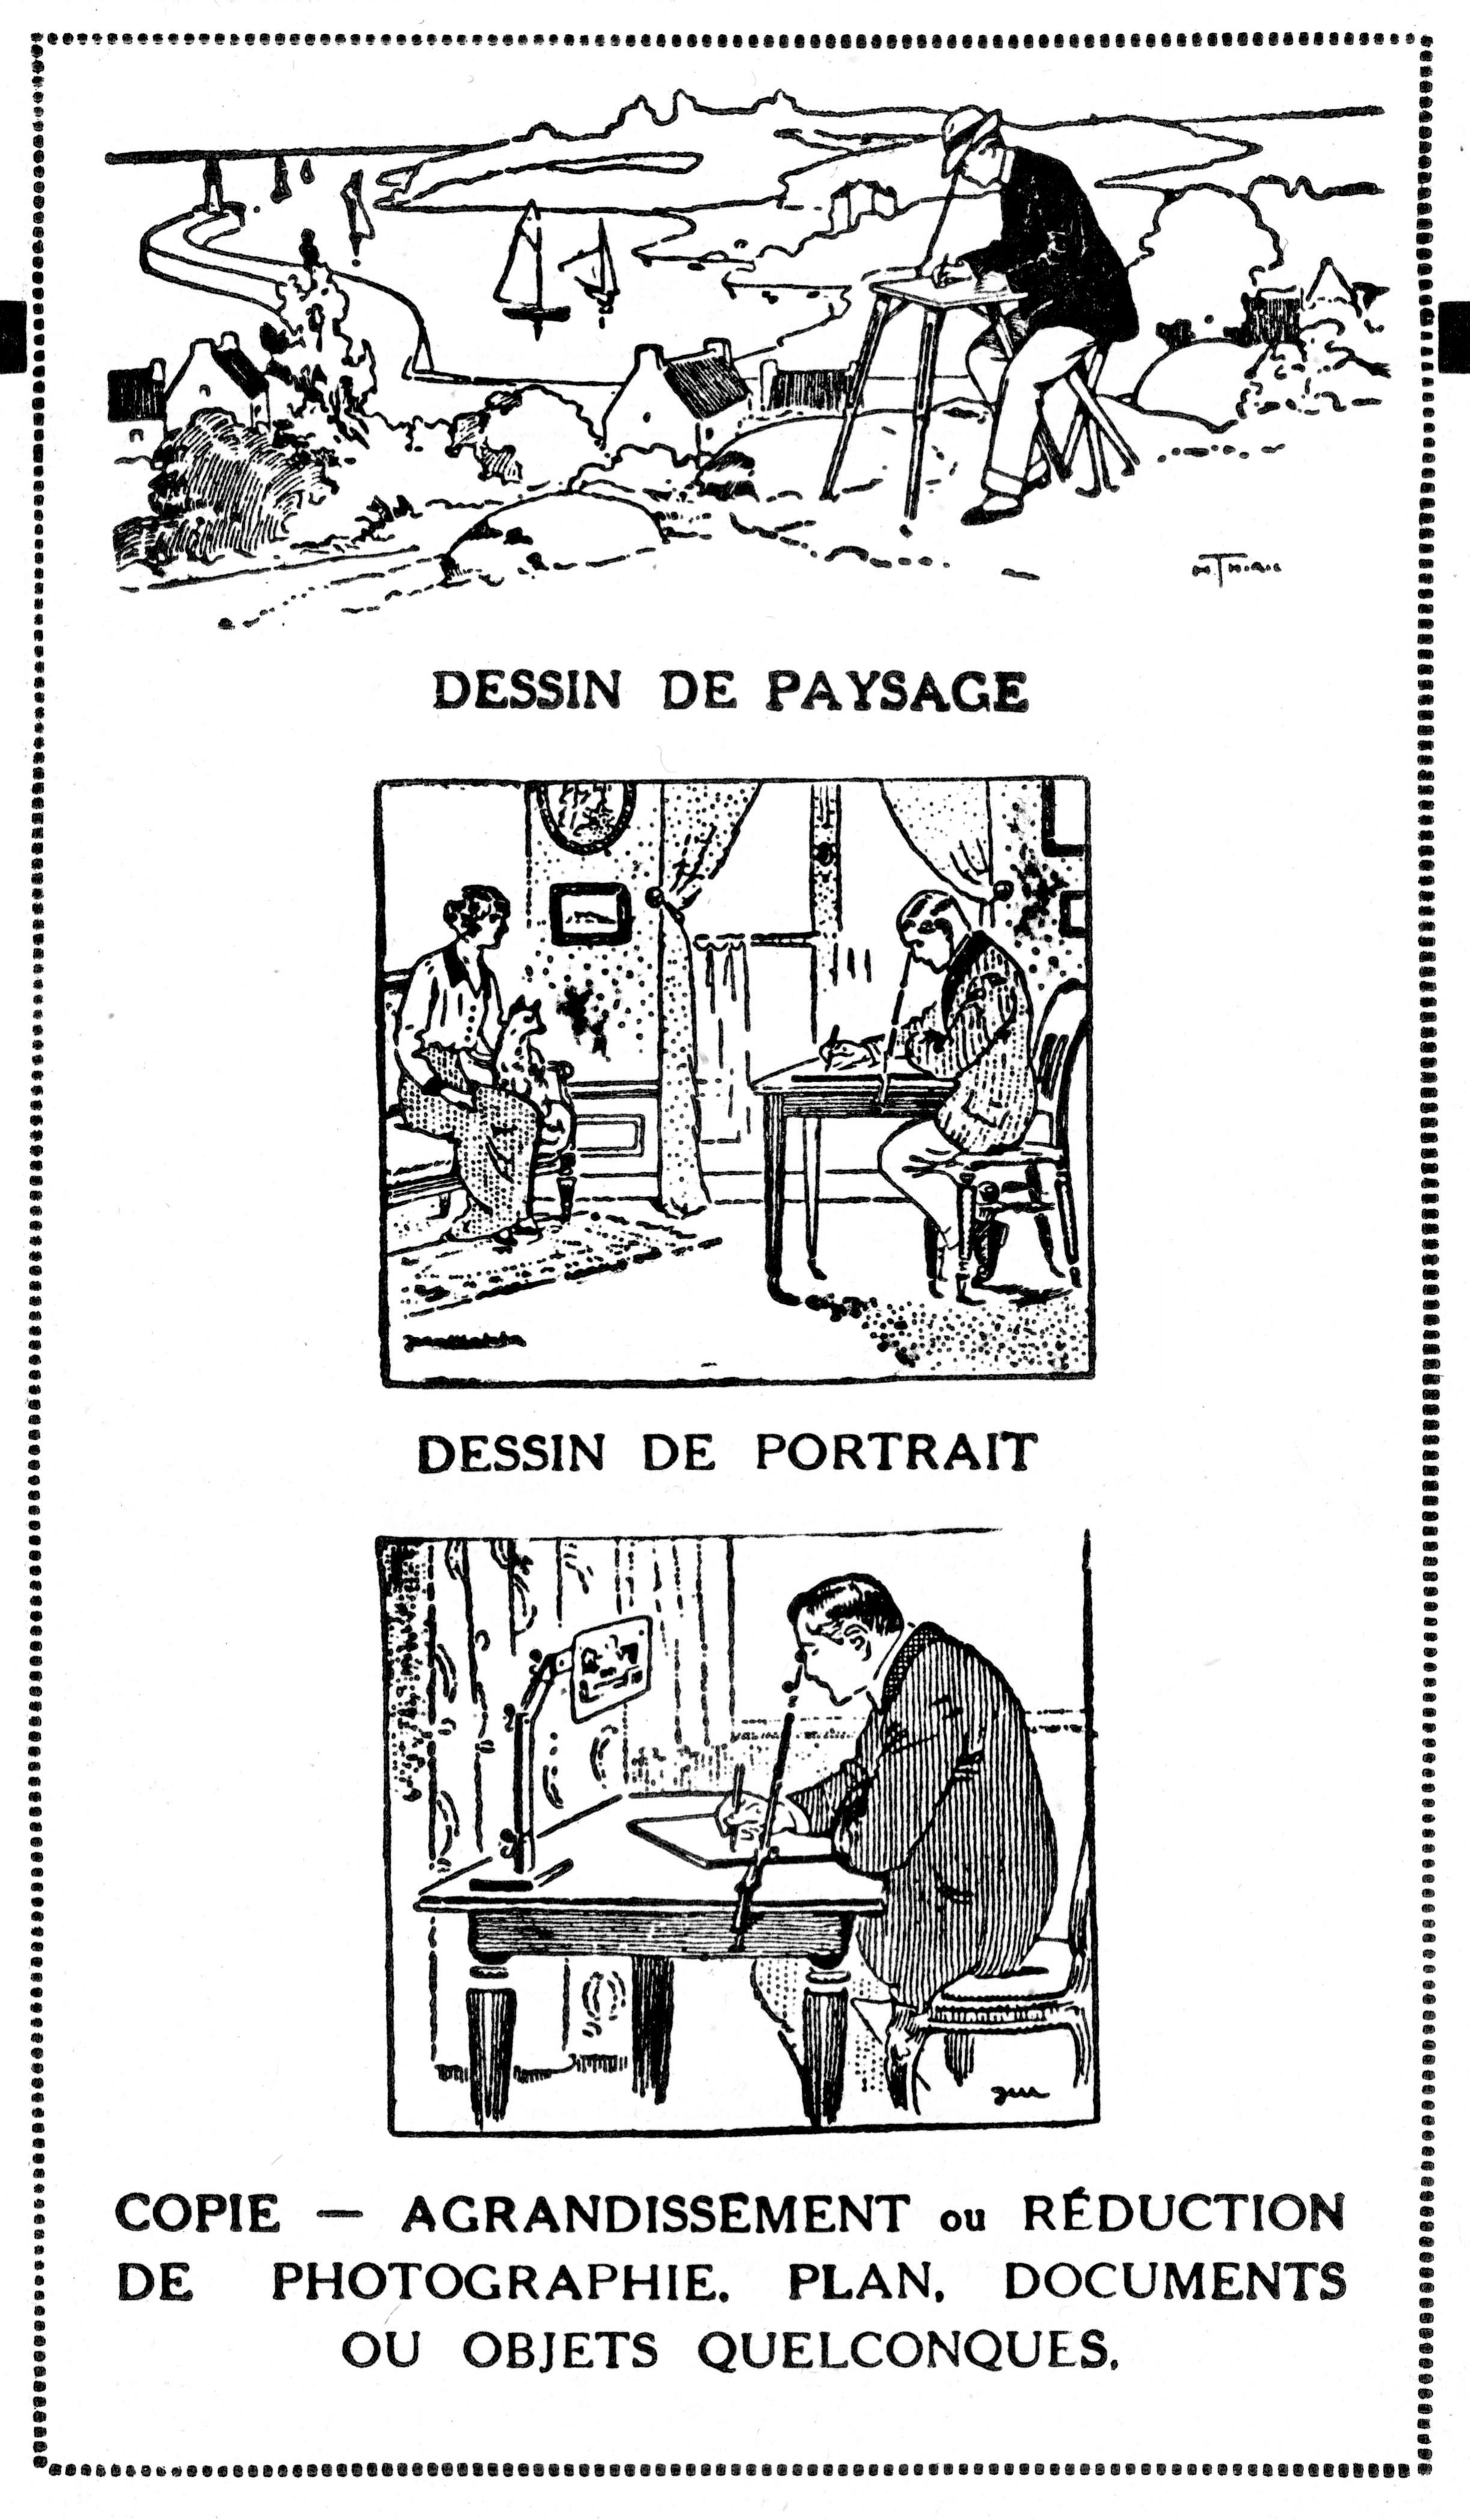 Chambre Claire Universelle, advertisement (1925)